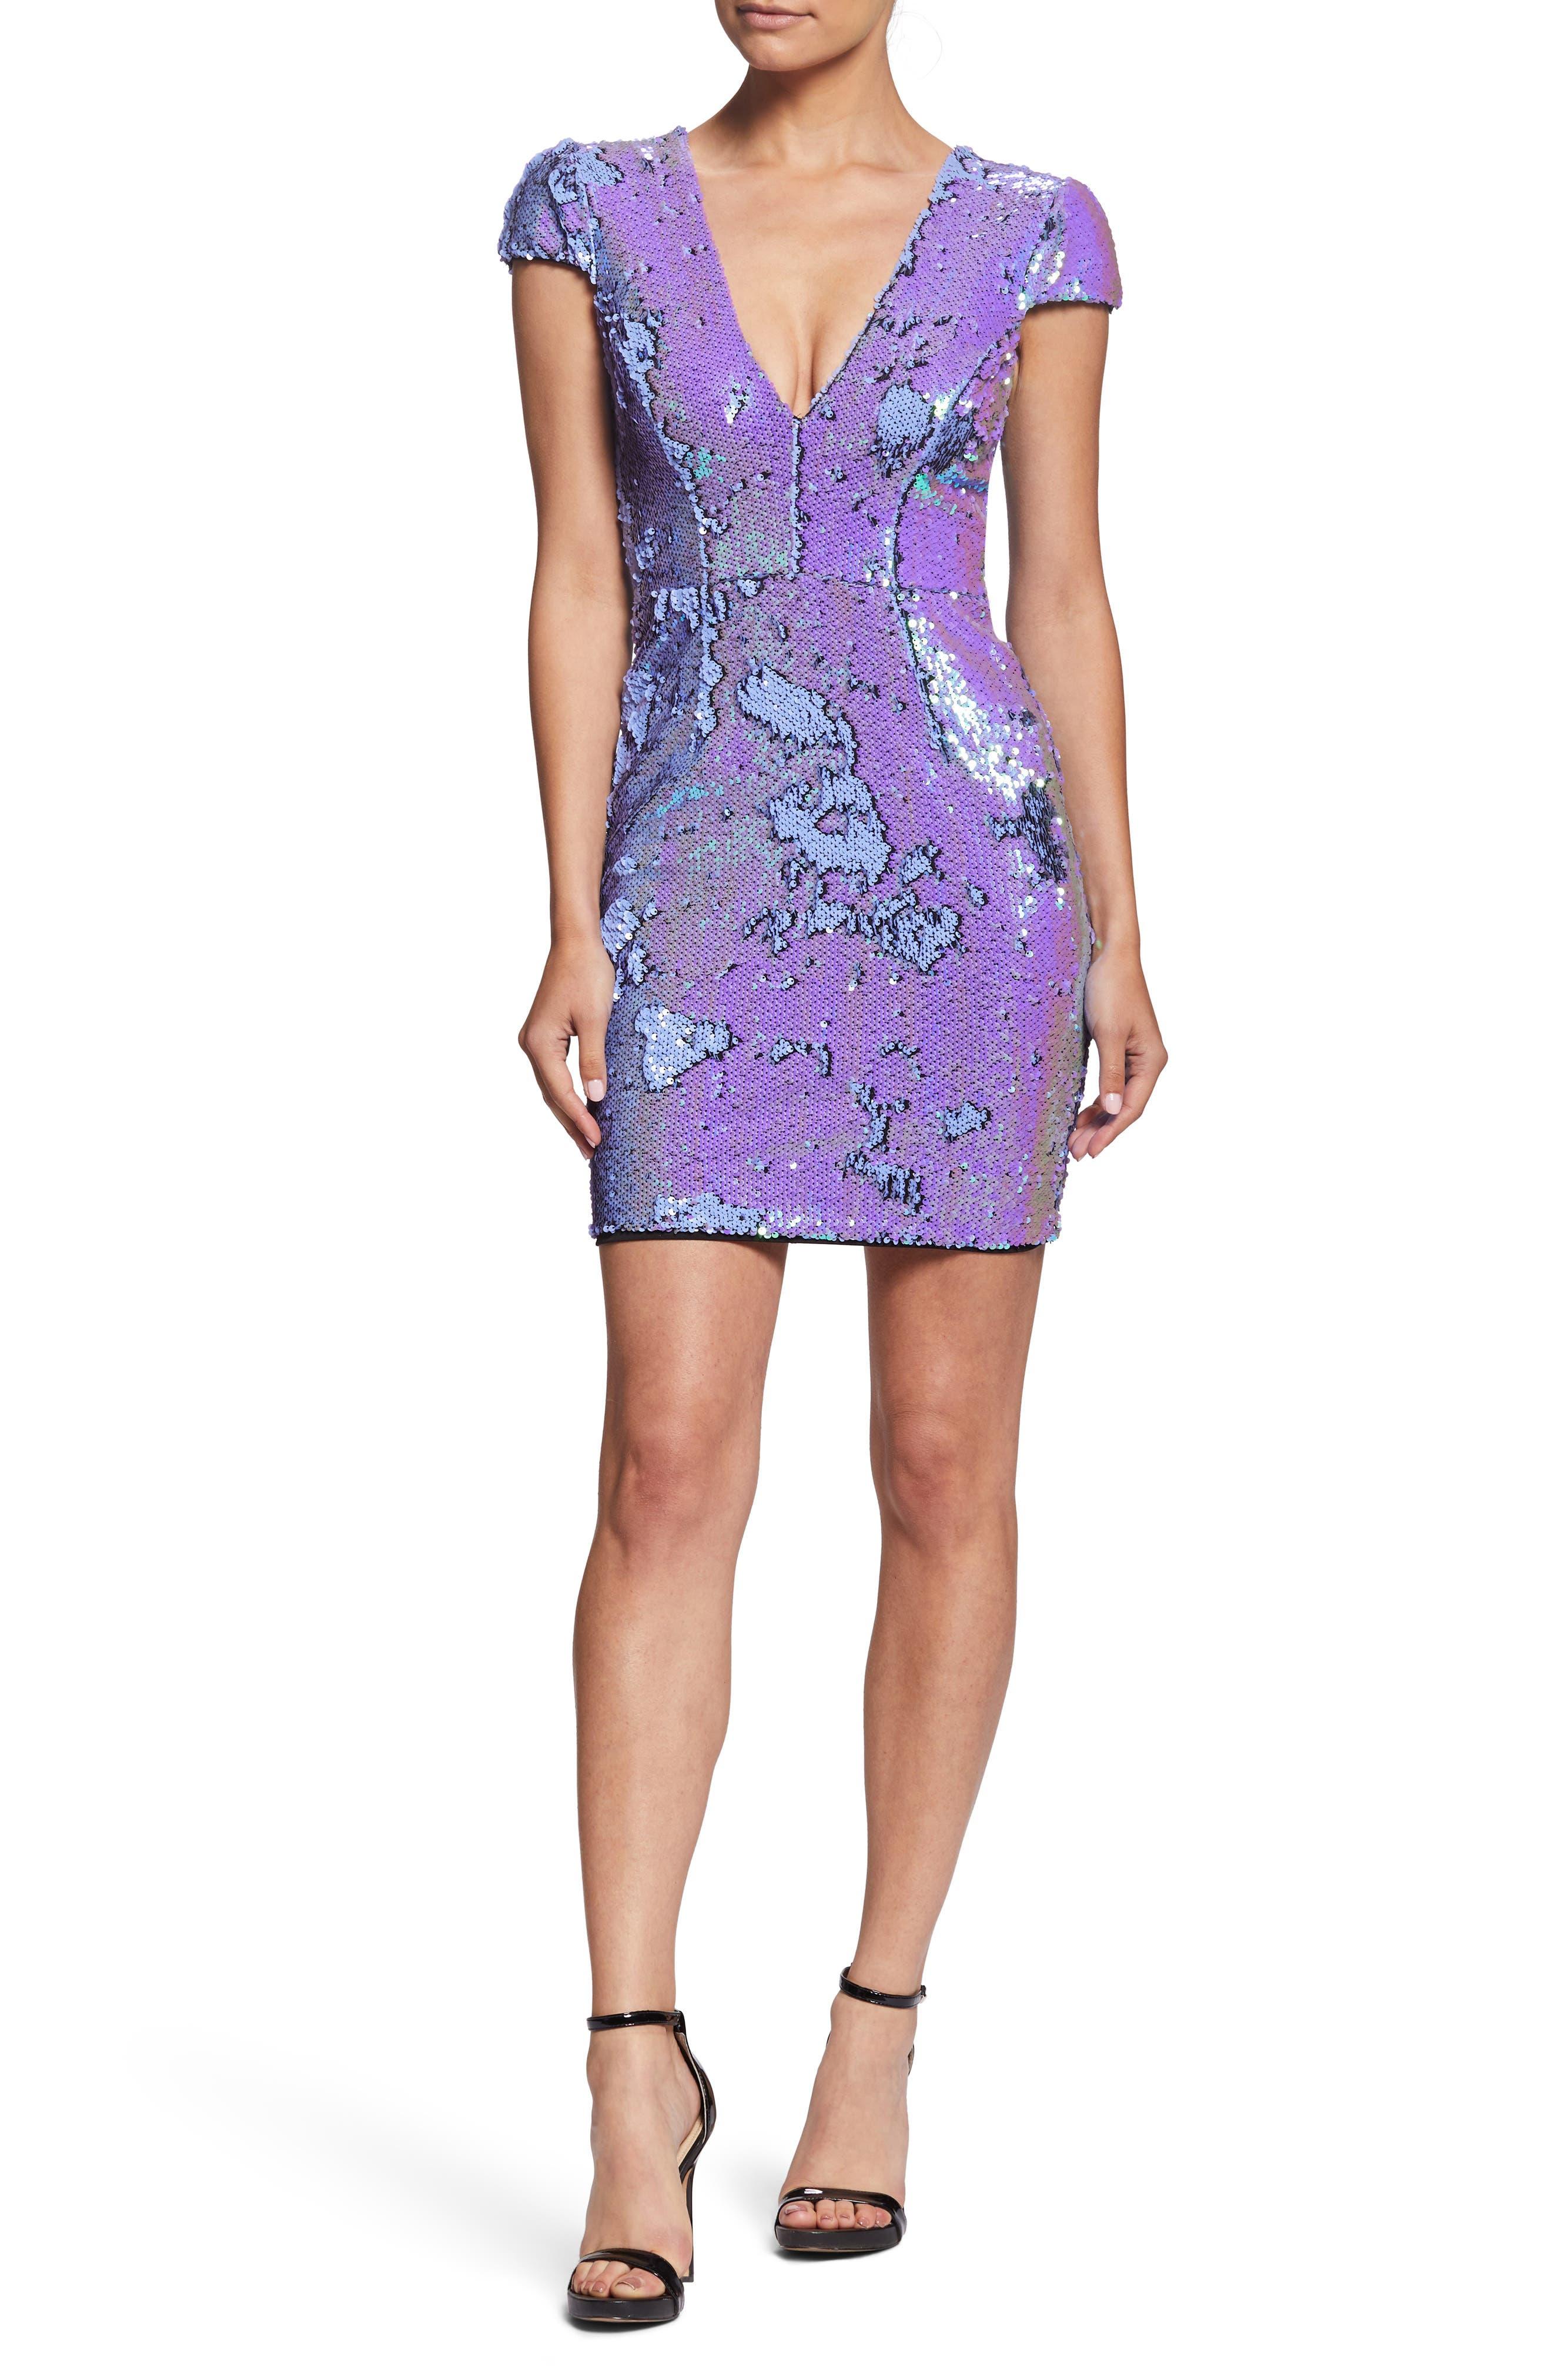 DRESS THE POPULATION Zoe Plunge Neck Sheath Dress in Ultra Violet